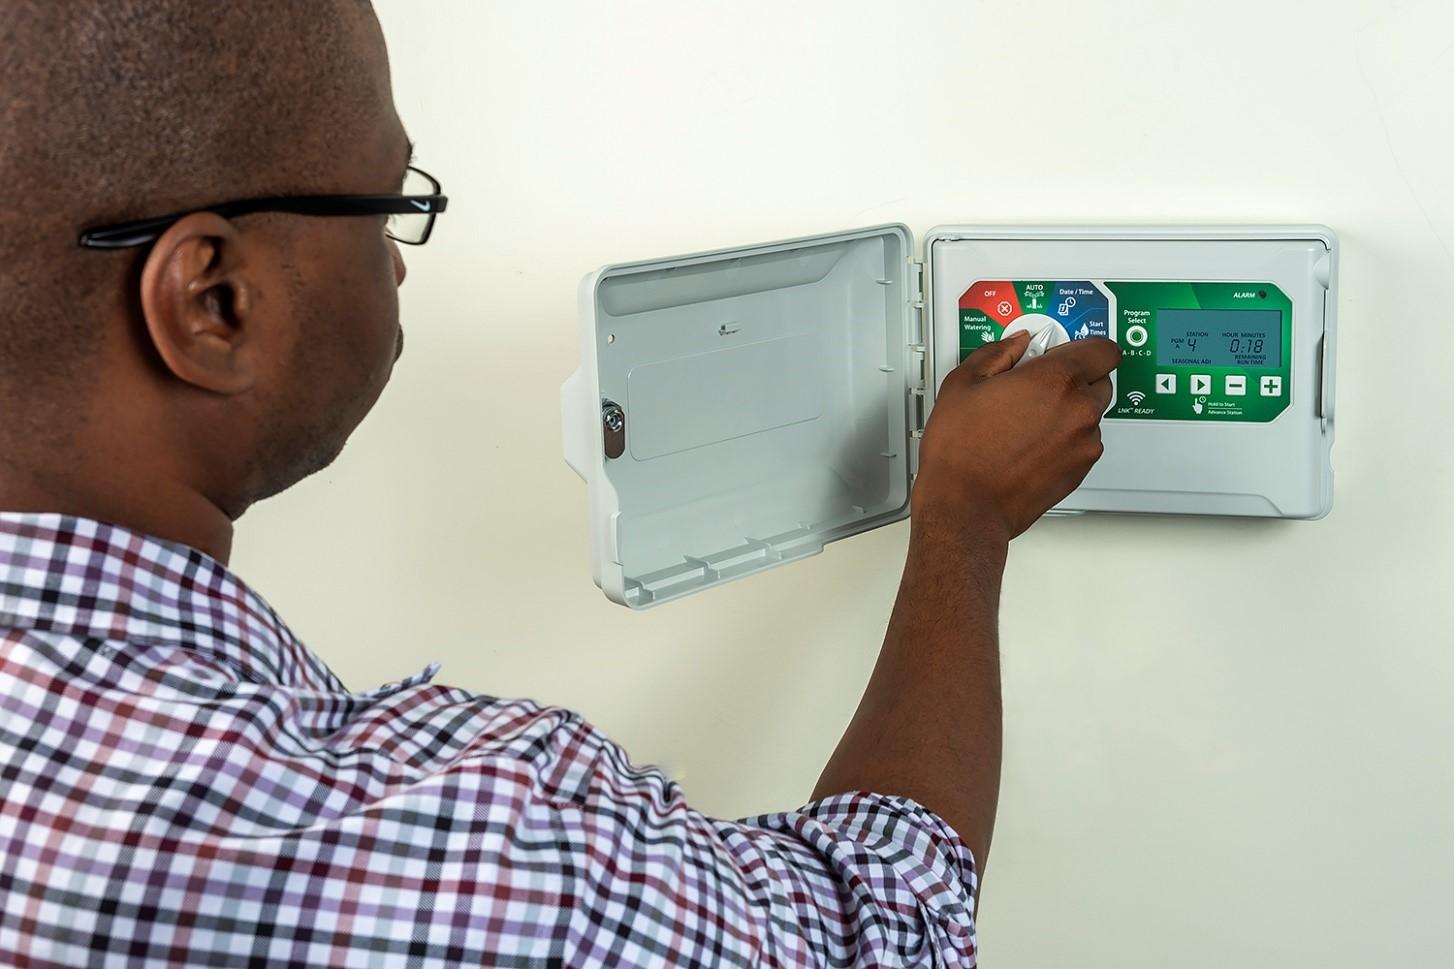 District employee setting sprinkler system